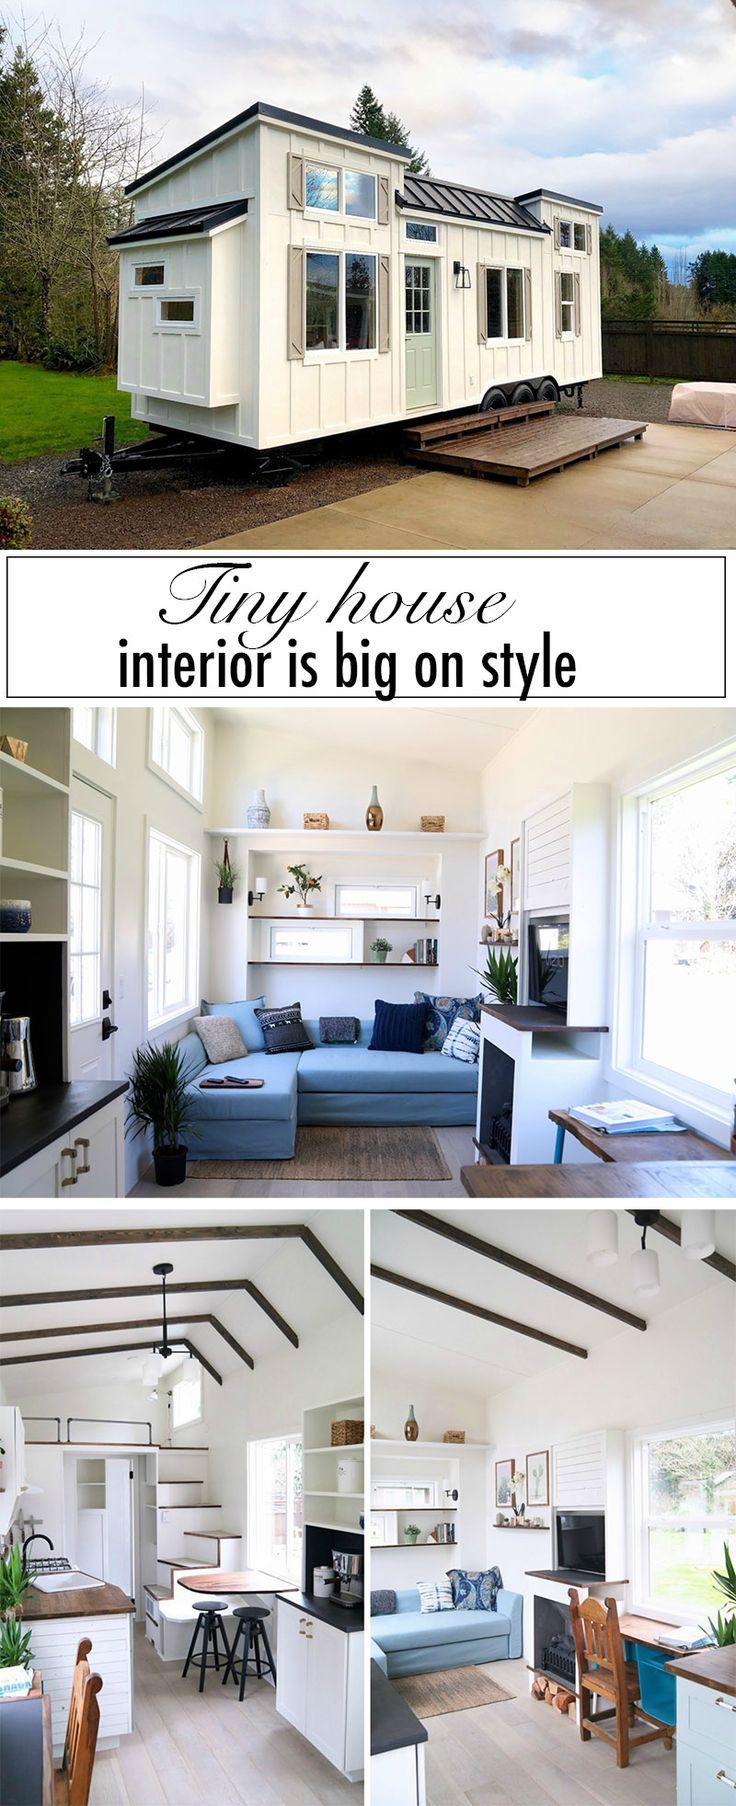 This custom-built tiny house is big on interior design…